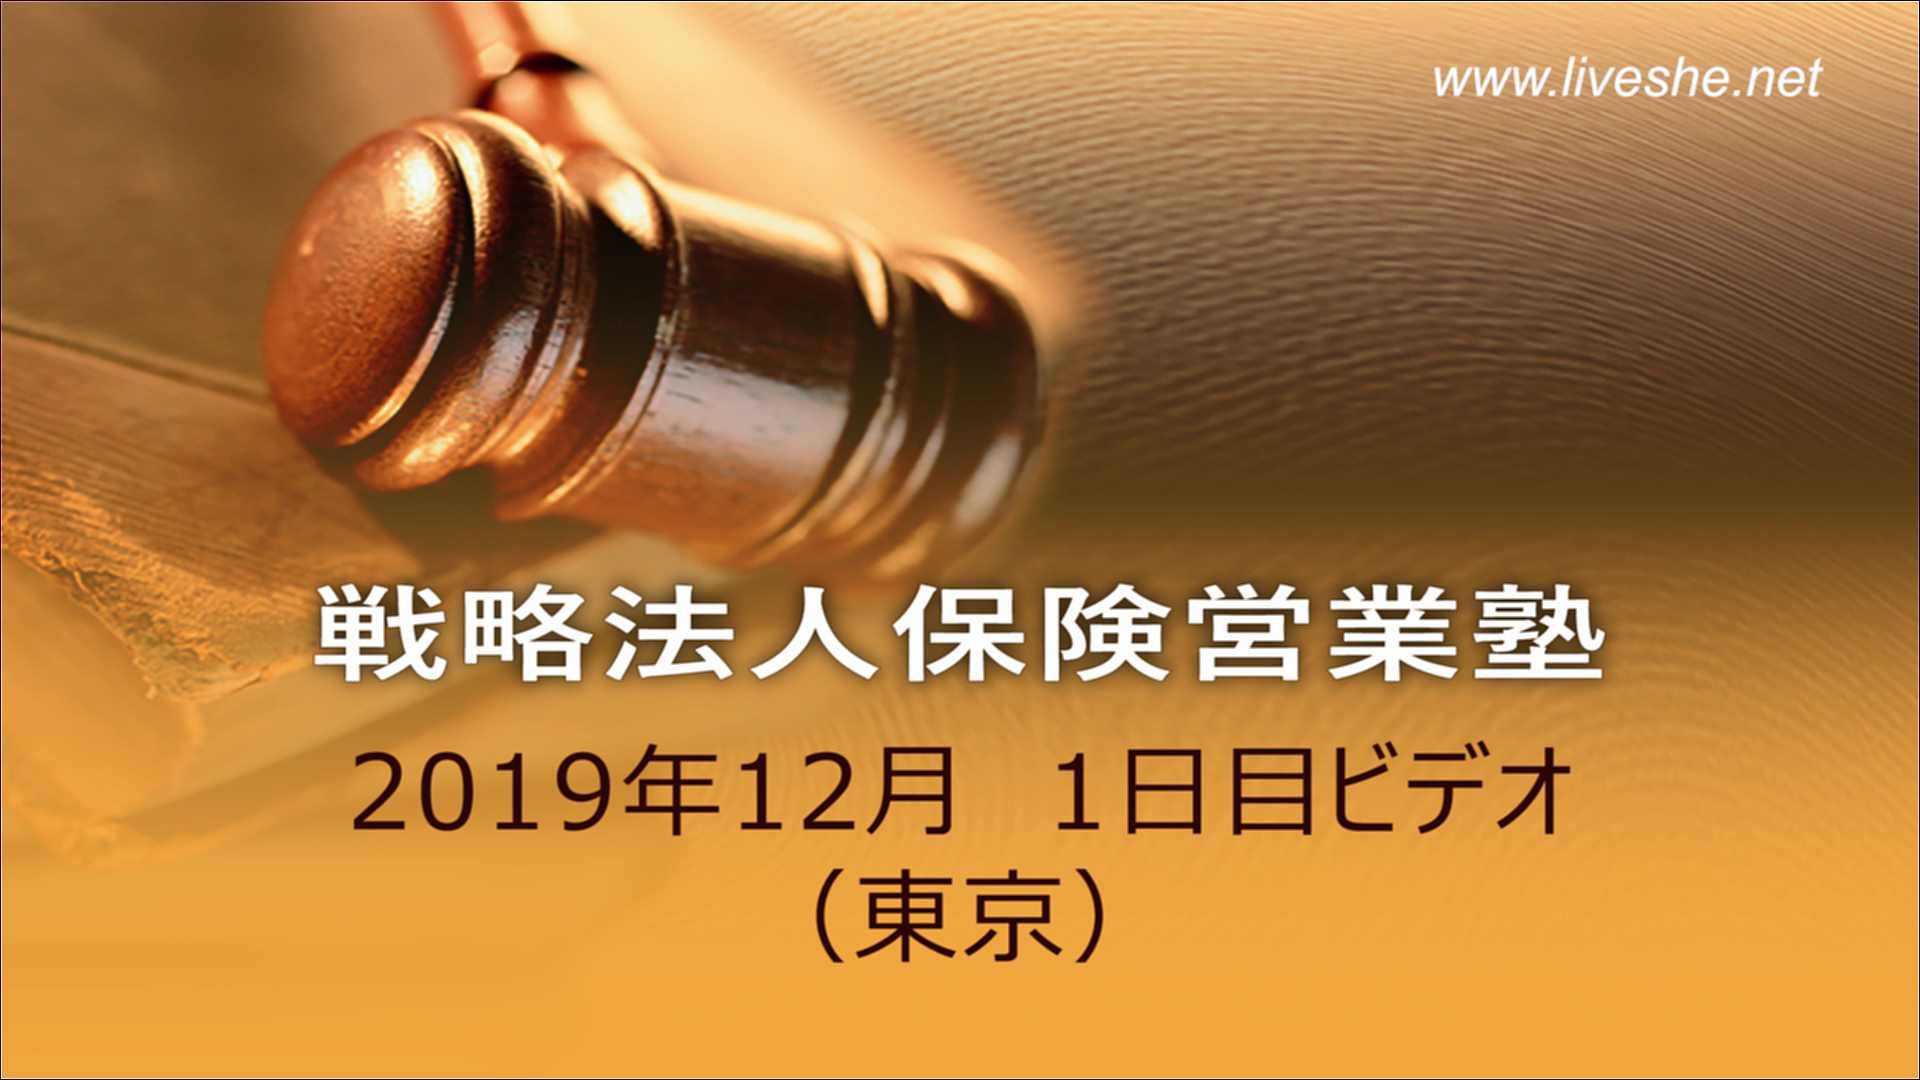 【受講者専用】 2019年12月度合宿1日目ビデオ(メンバー限定)